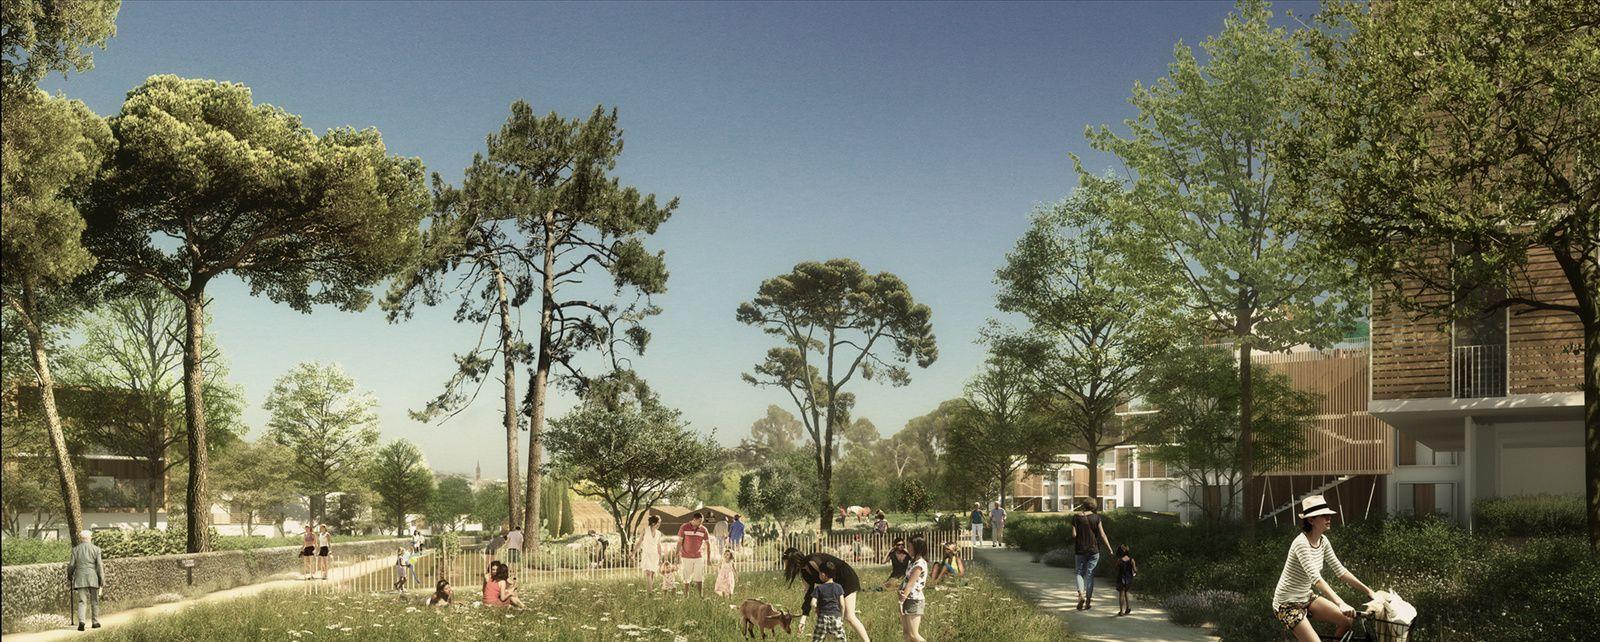 Architecte Agence Devillers - Montpellier